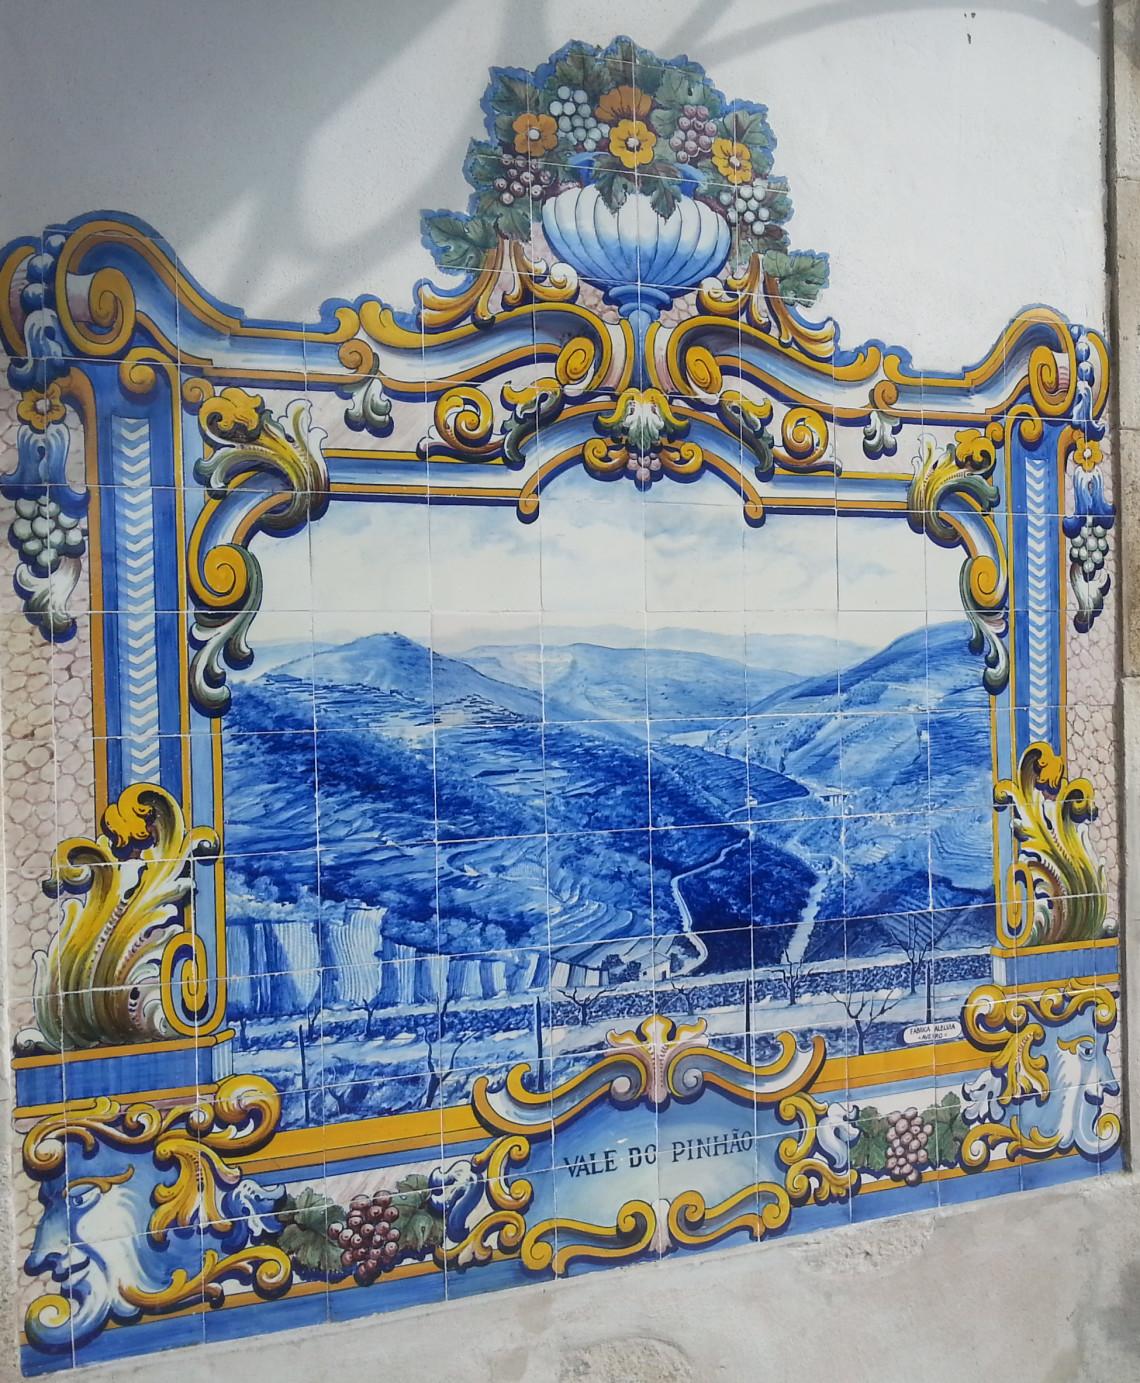 Obraz Dolina Pinhao na ceramice